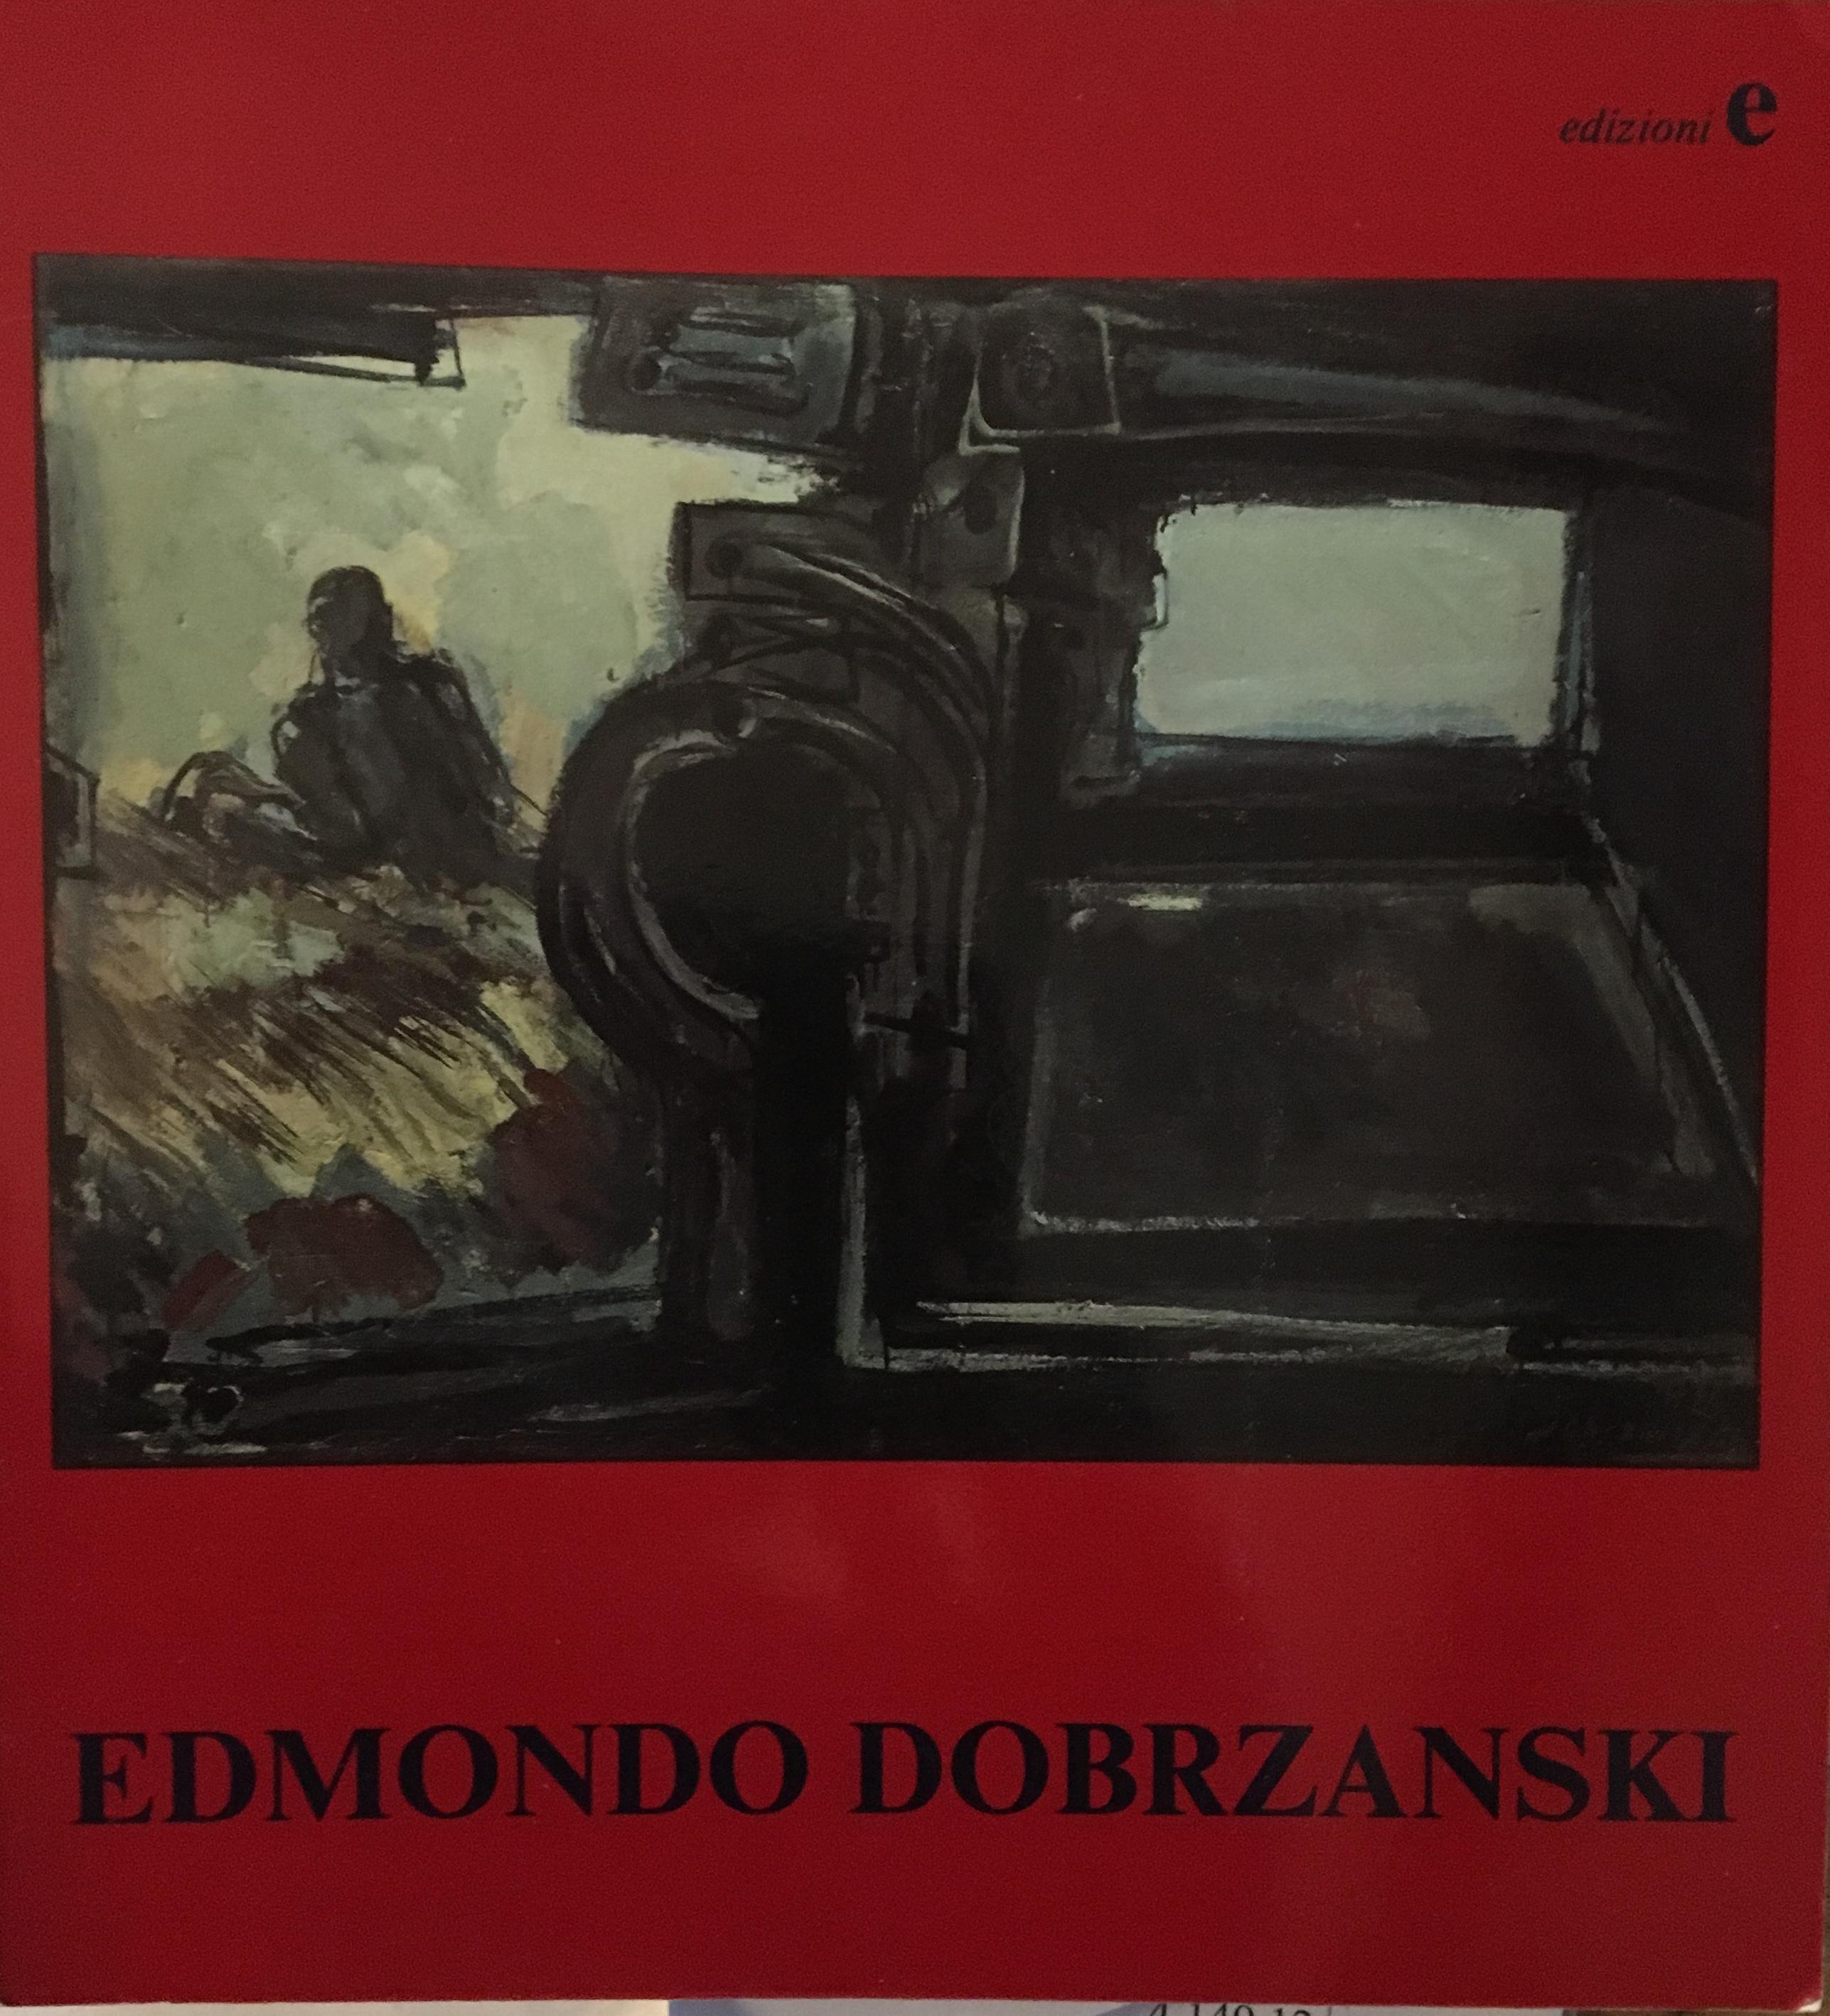 Edmondo Dobrzanski